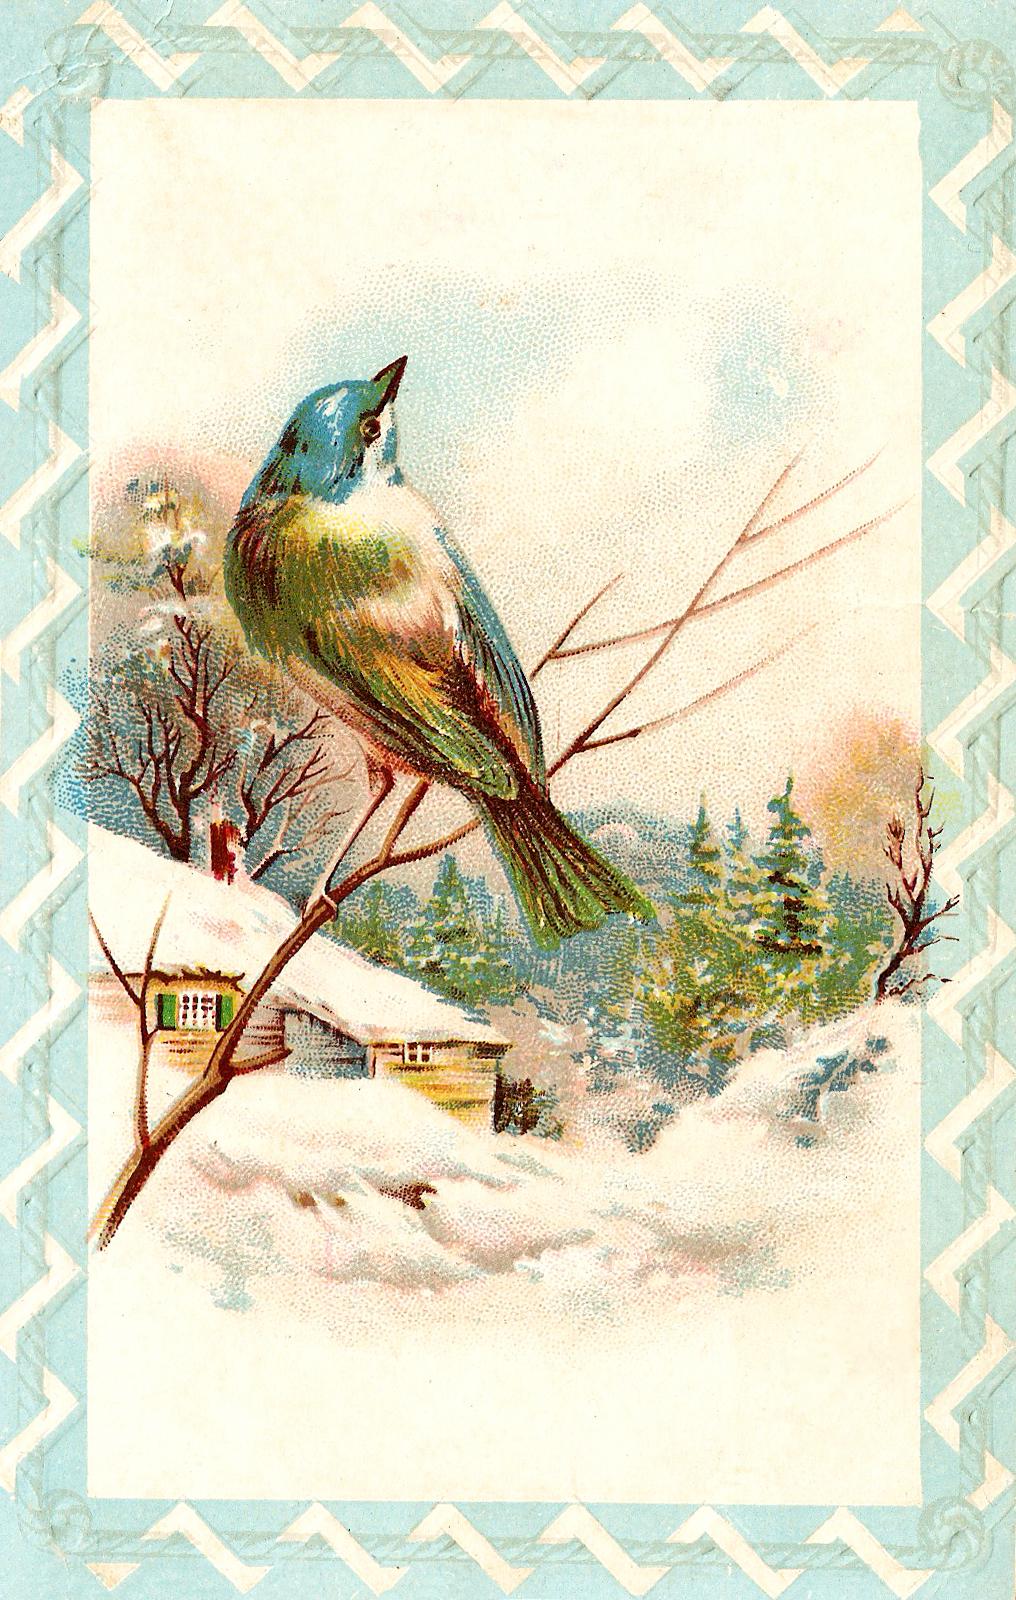 Vintage winter anniversary clipart banner free library Free Vintage Winter Cliparts, Download Free Clip Art, Free ... banner free library